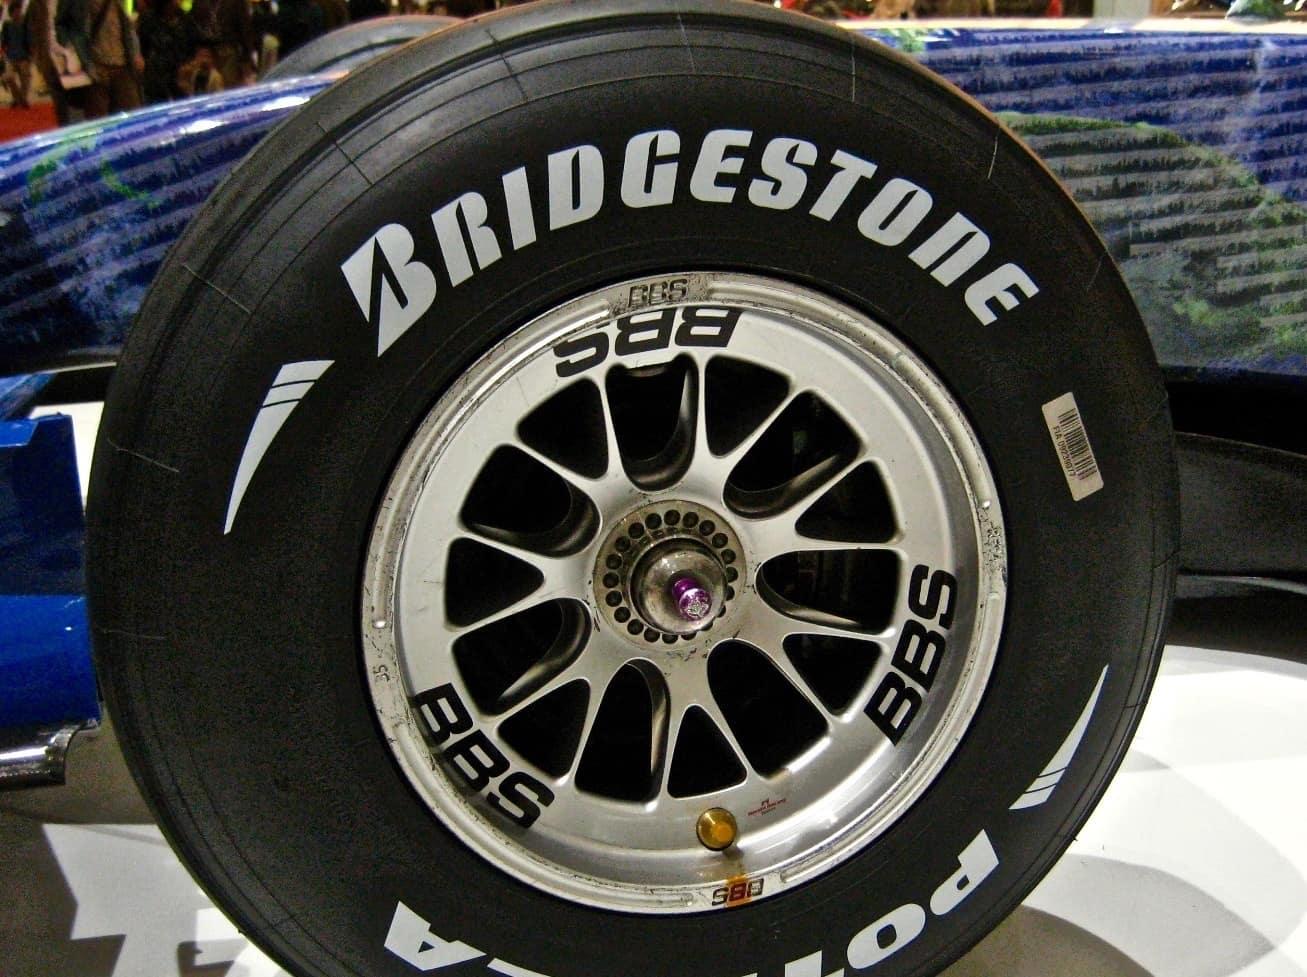 Bridgestone Joliette